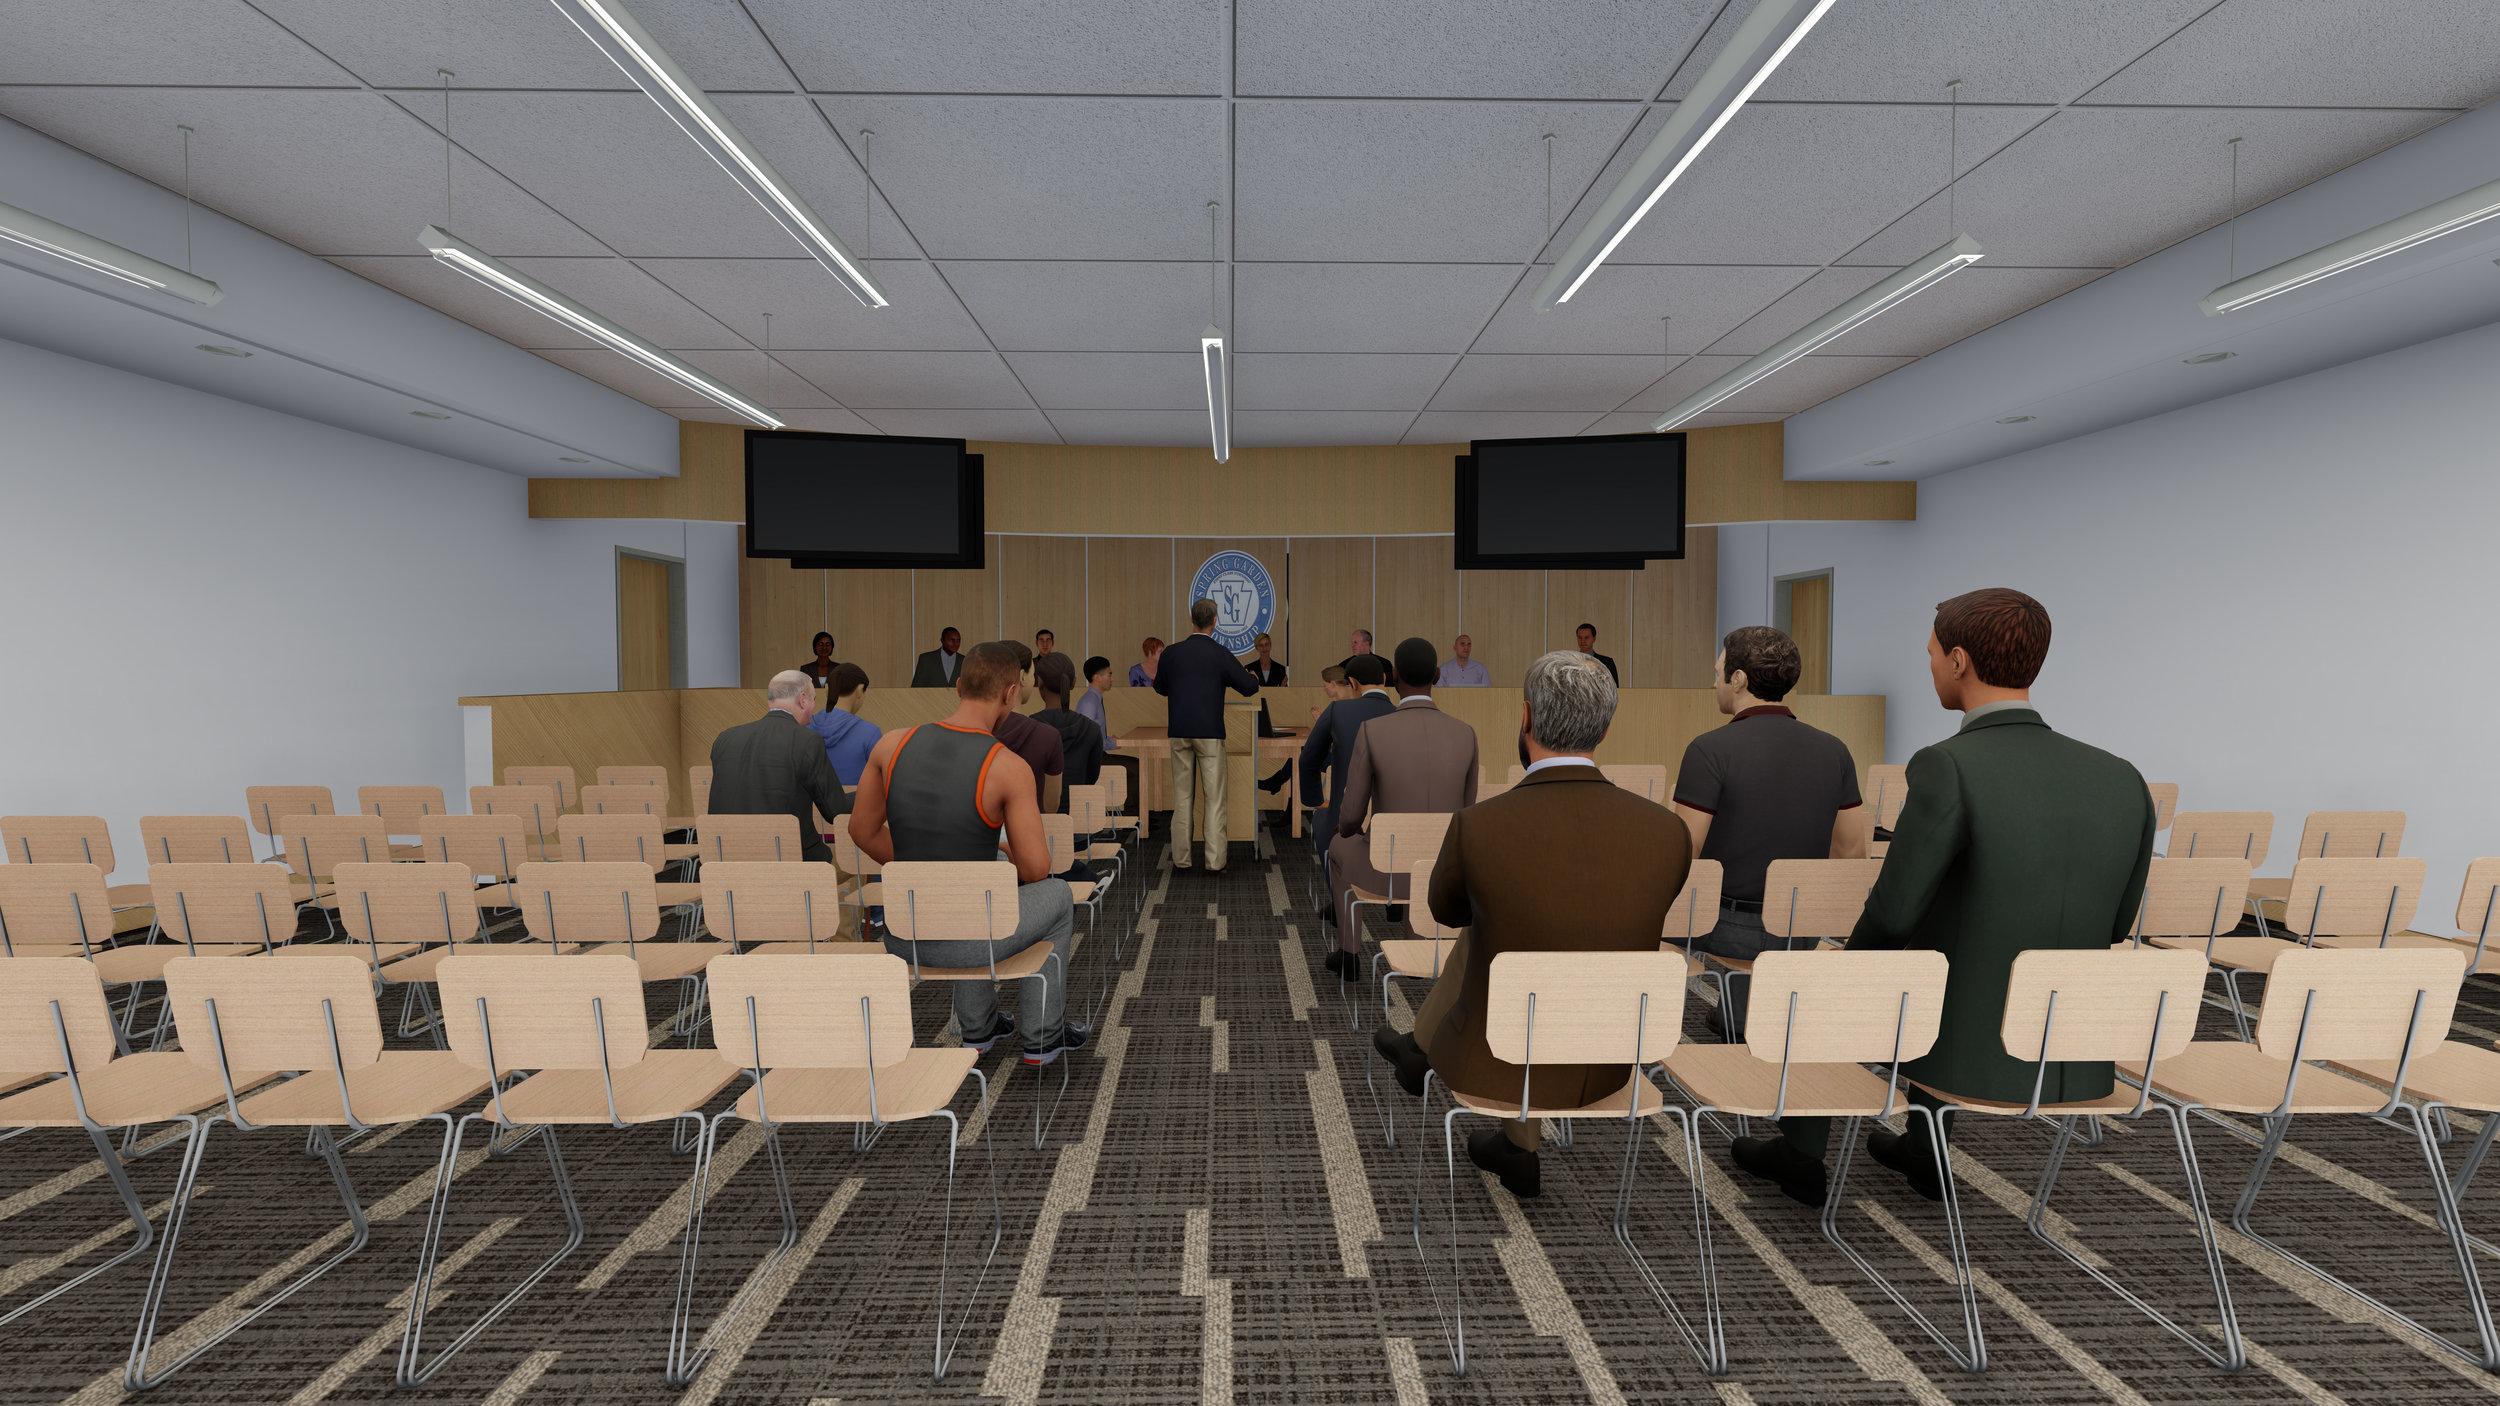 Interior Meeting Room.jpg